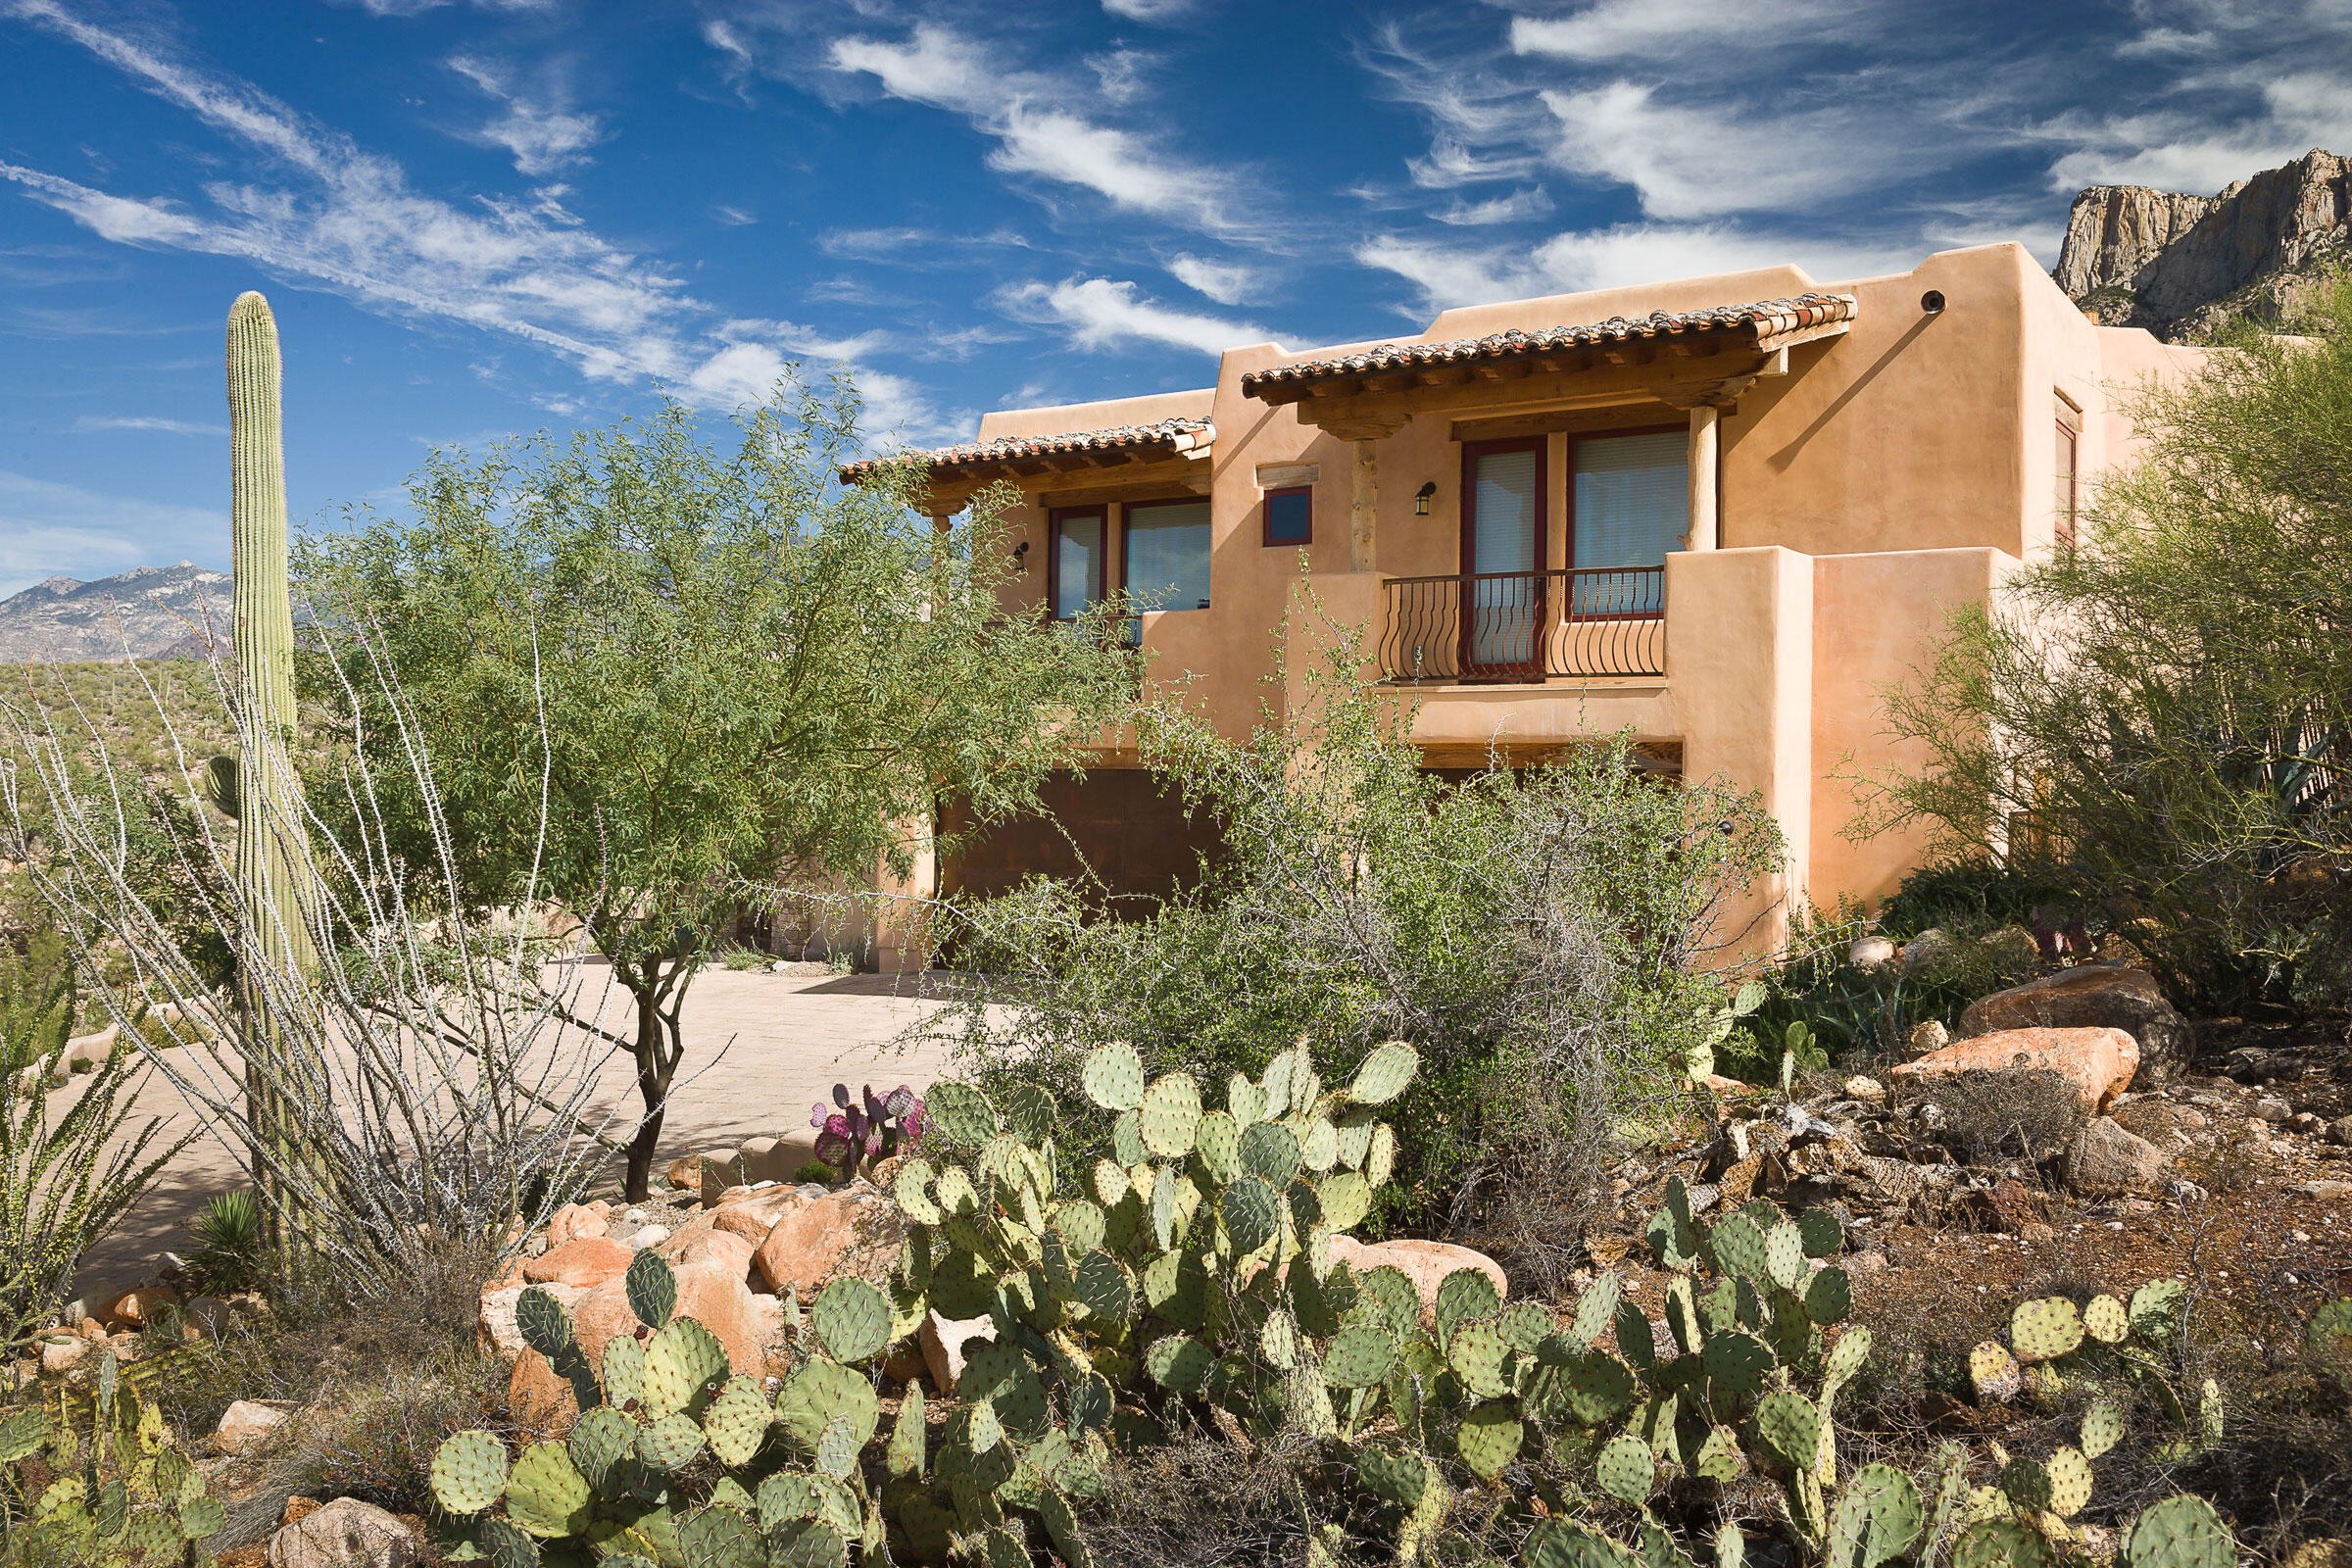 Engelmann's prickly pear, saguaro, ocotillo, and desert willow fill a desert garden in Tucson, Arizona. Mark Turner